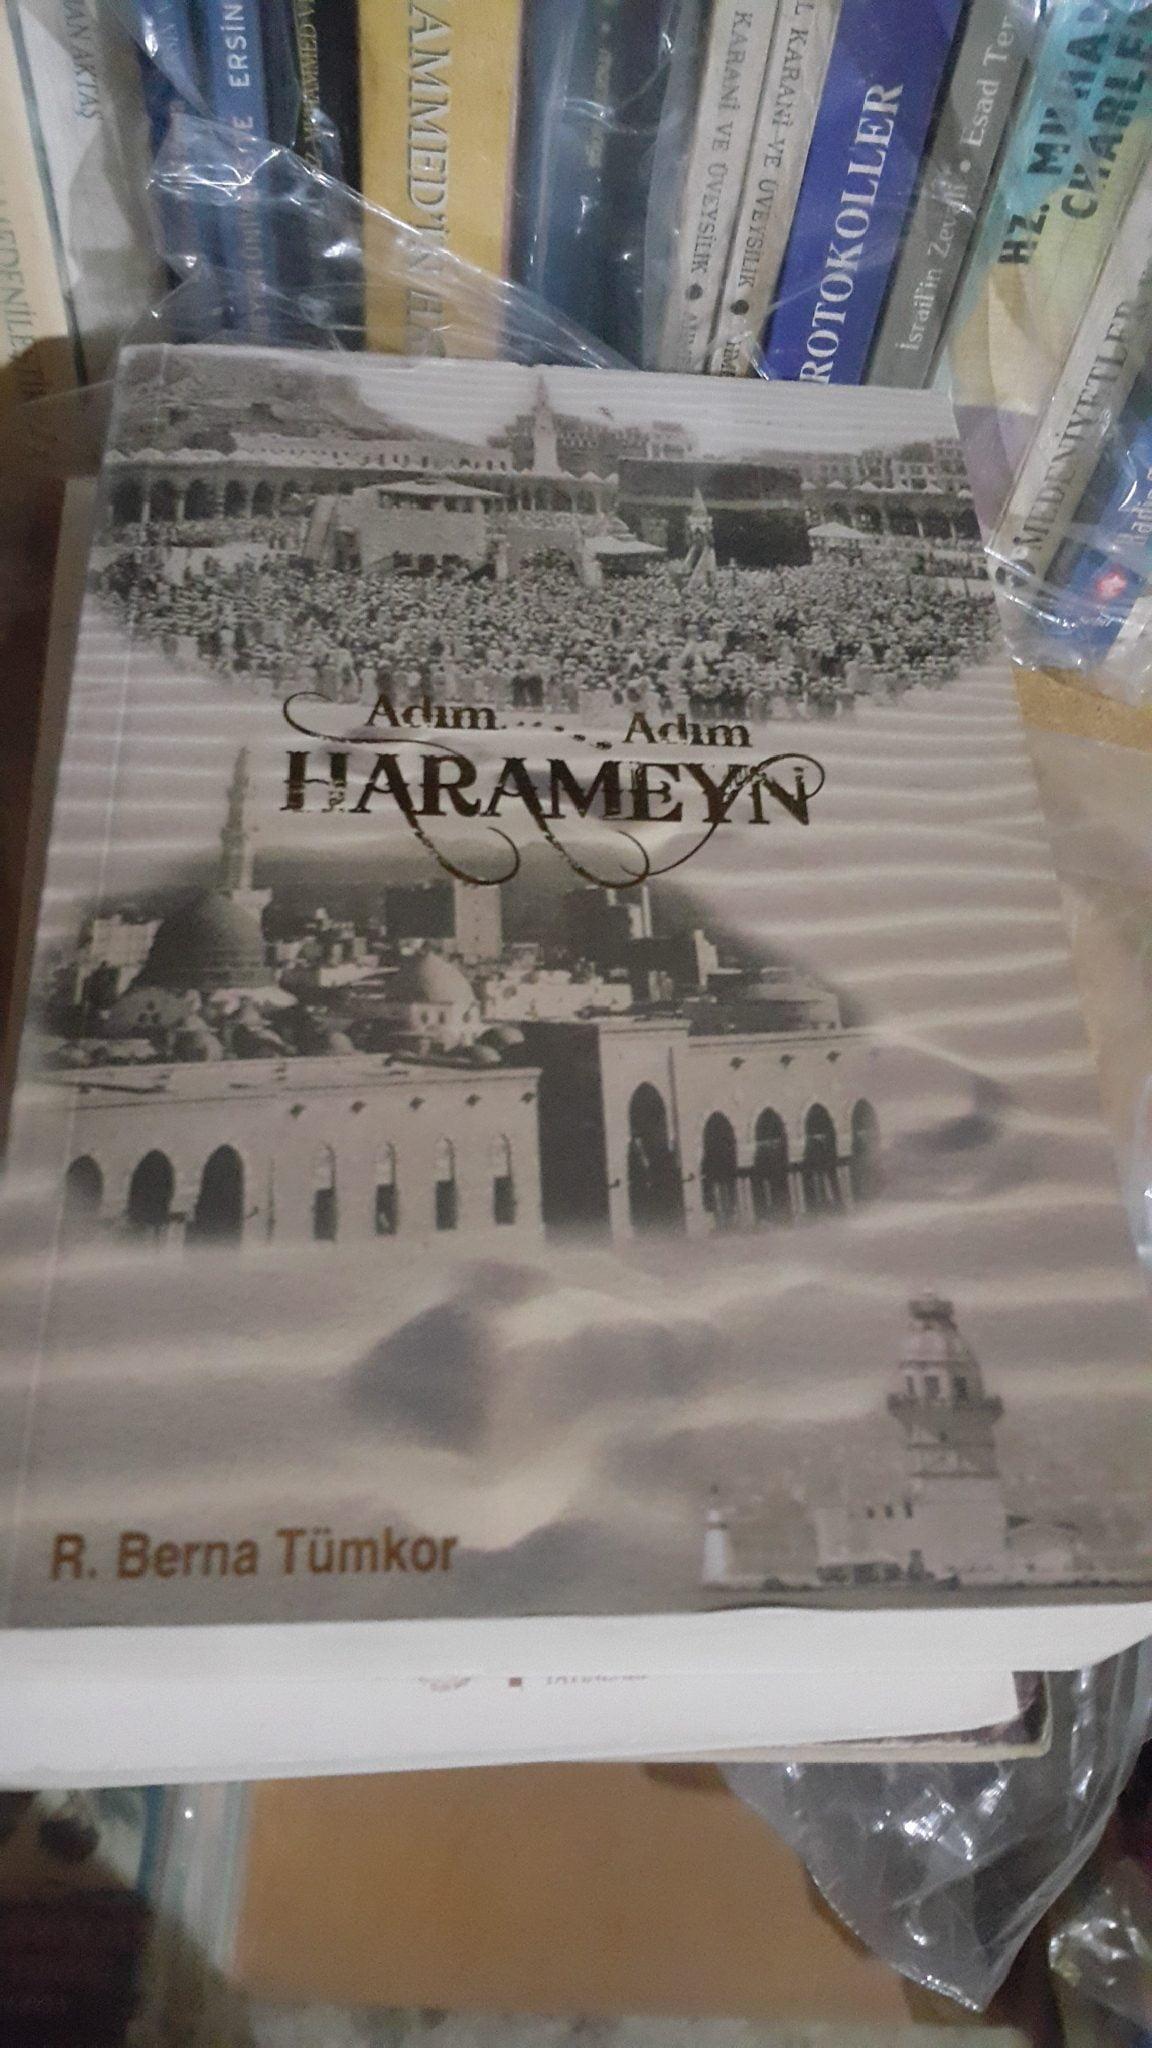 ADIM ADIM HARAMEYN/Rabia Berna Tümkor